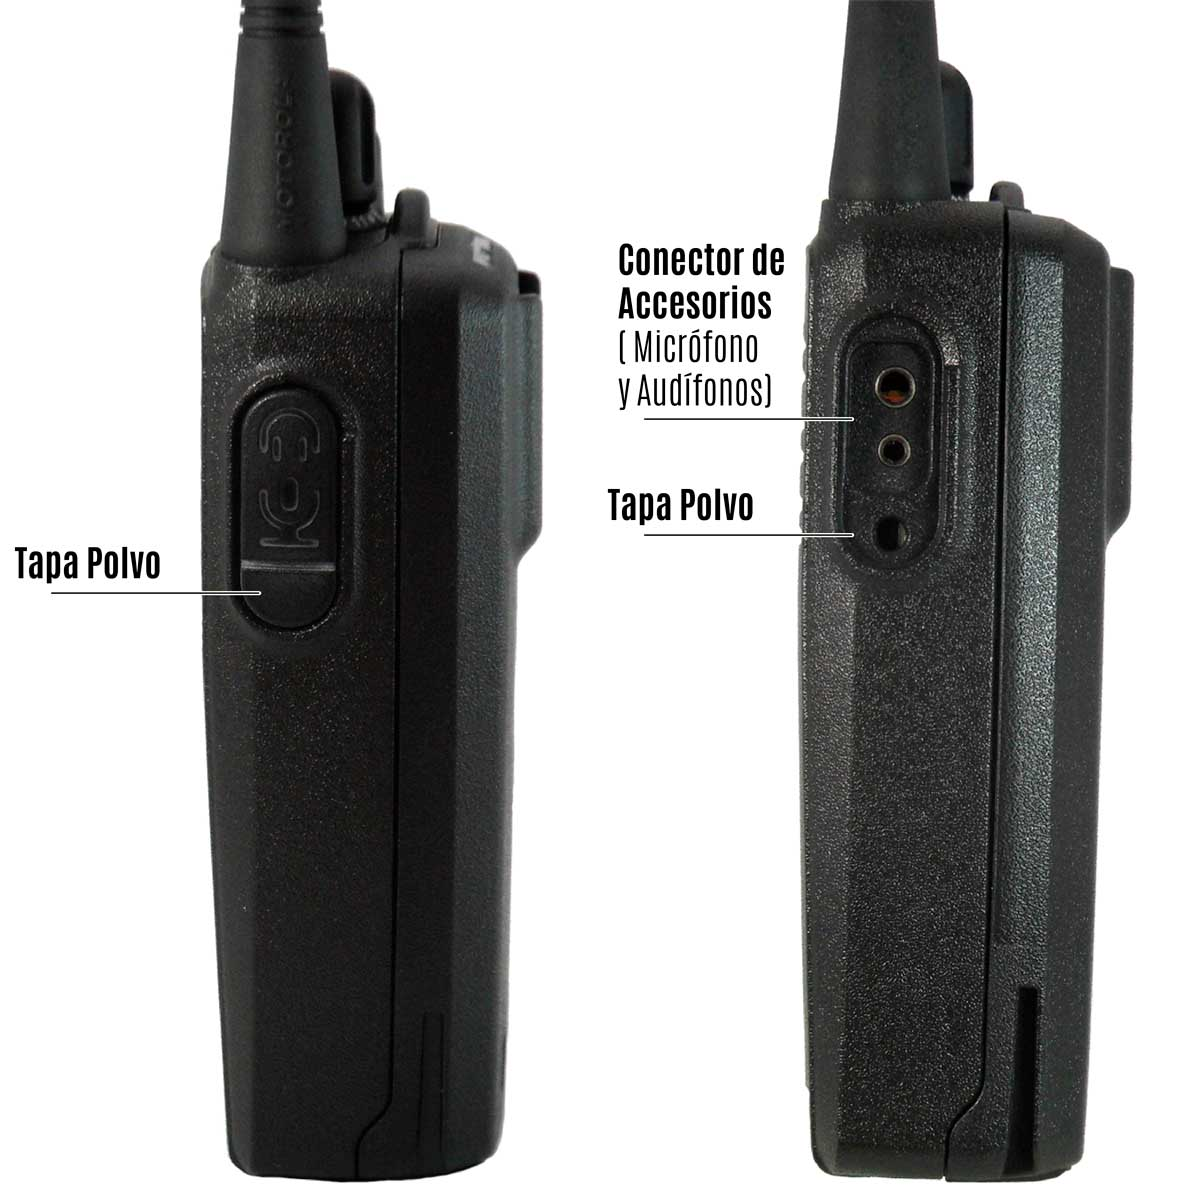 Radio Motorola EP350 MX Analógico LAH03KEH8AB7AN VHF 136-174 MHz con pantalla y teclado reducido